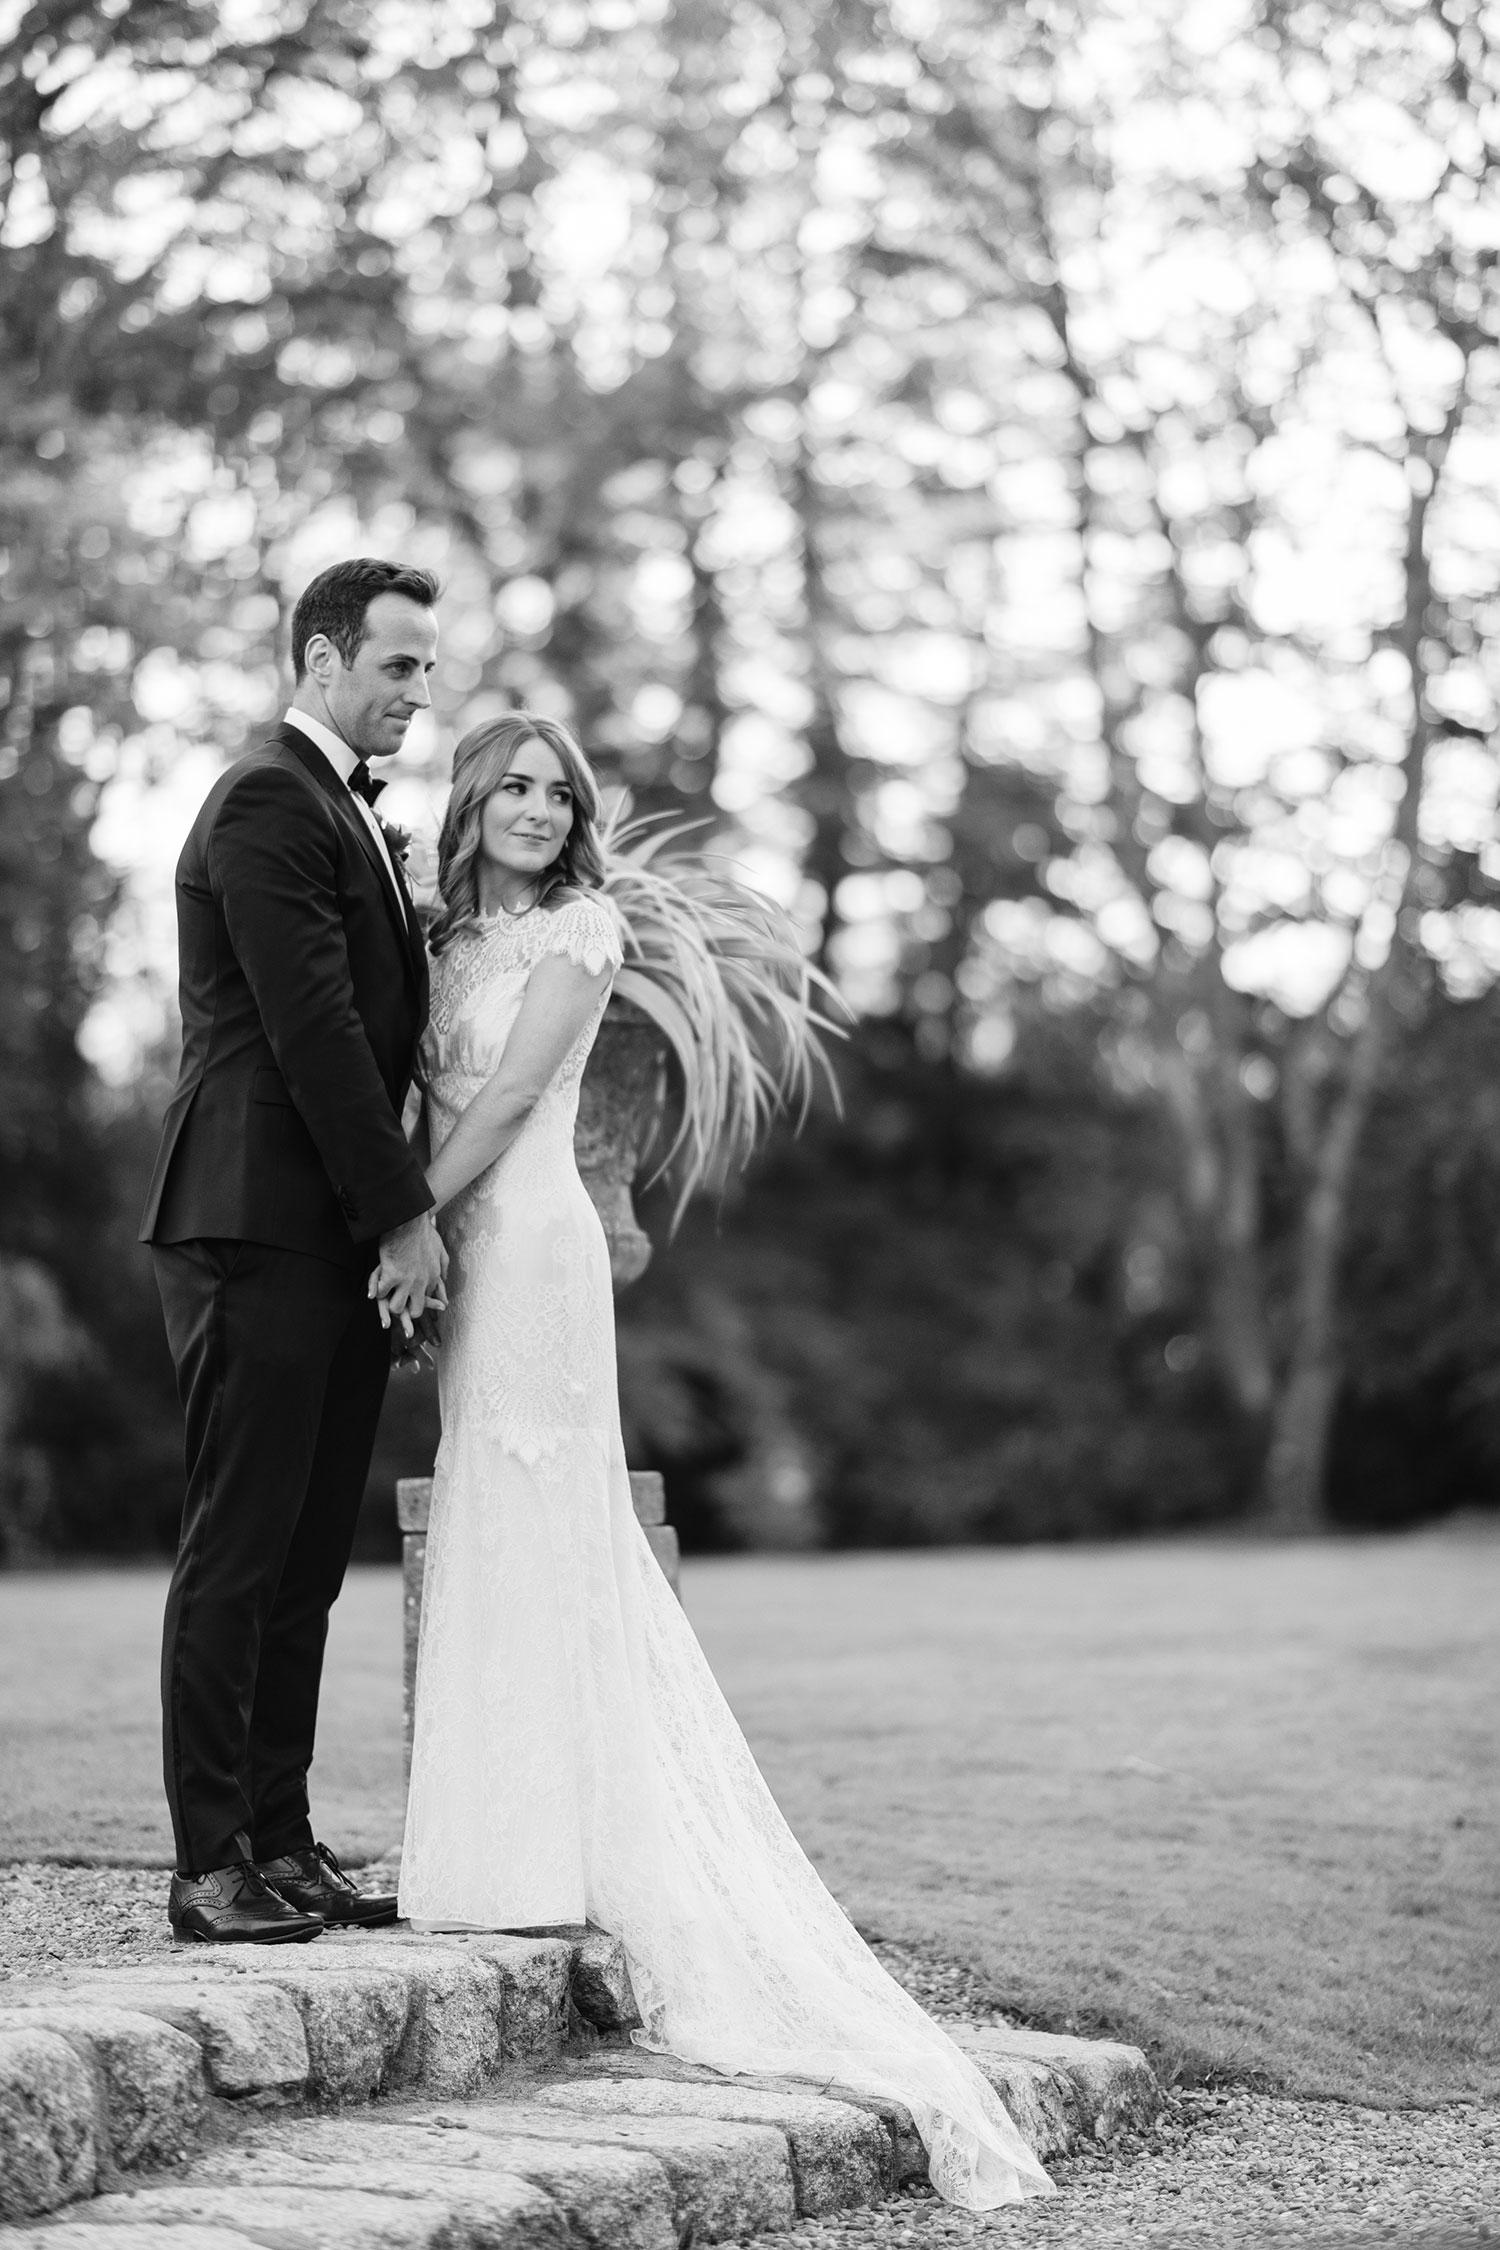 bellinter-house-wedding-photographer-0110_0110.jpg